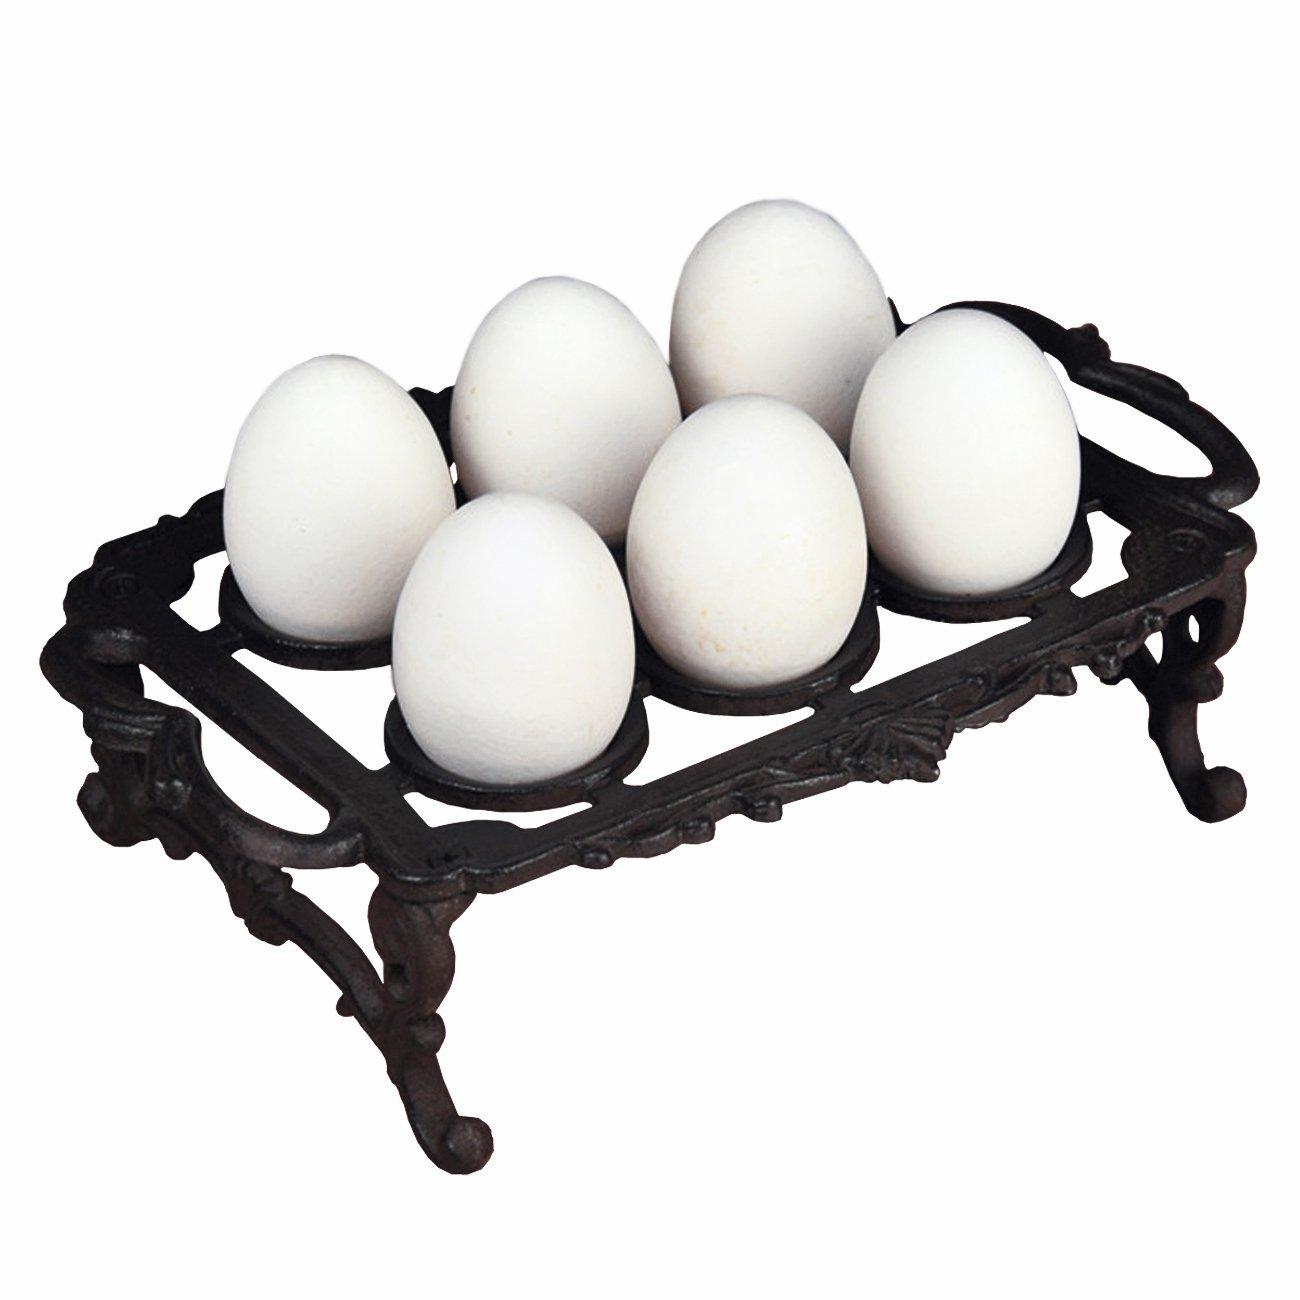 Ogrmar Vintage Cast Iron 6 Egg Holder Tray with Handles for Kithcken (Black)